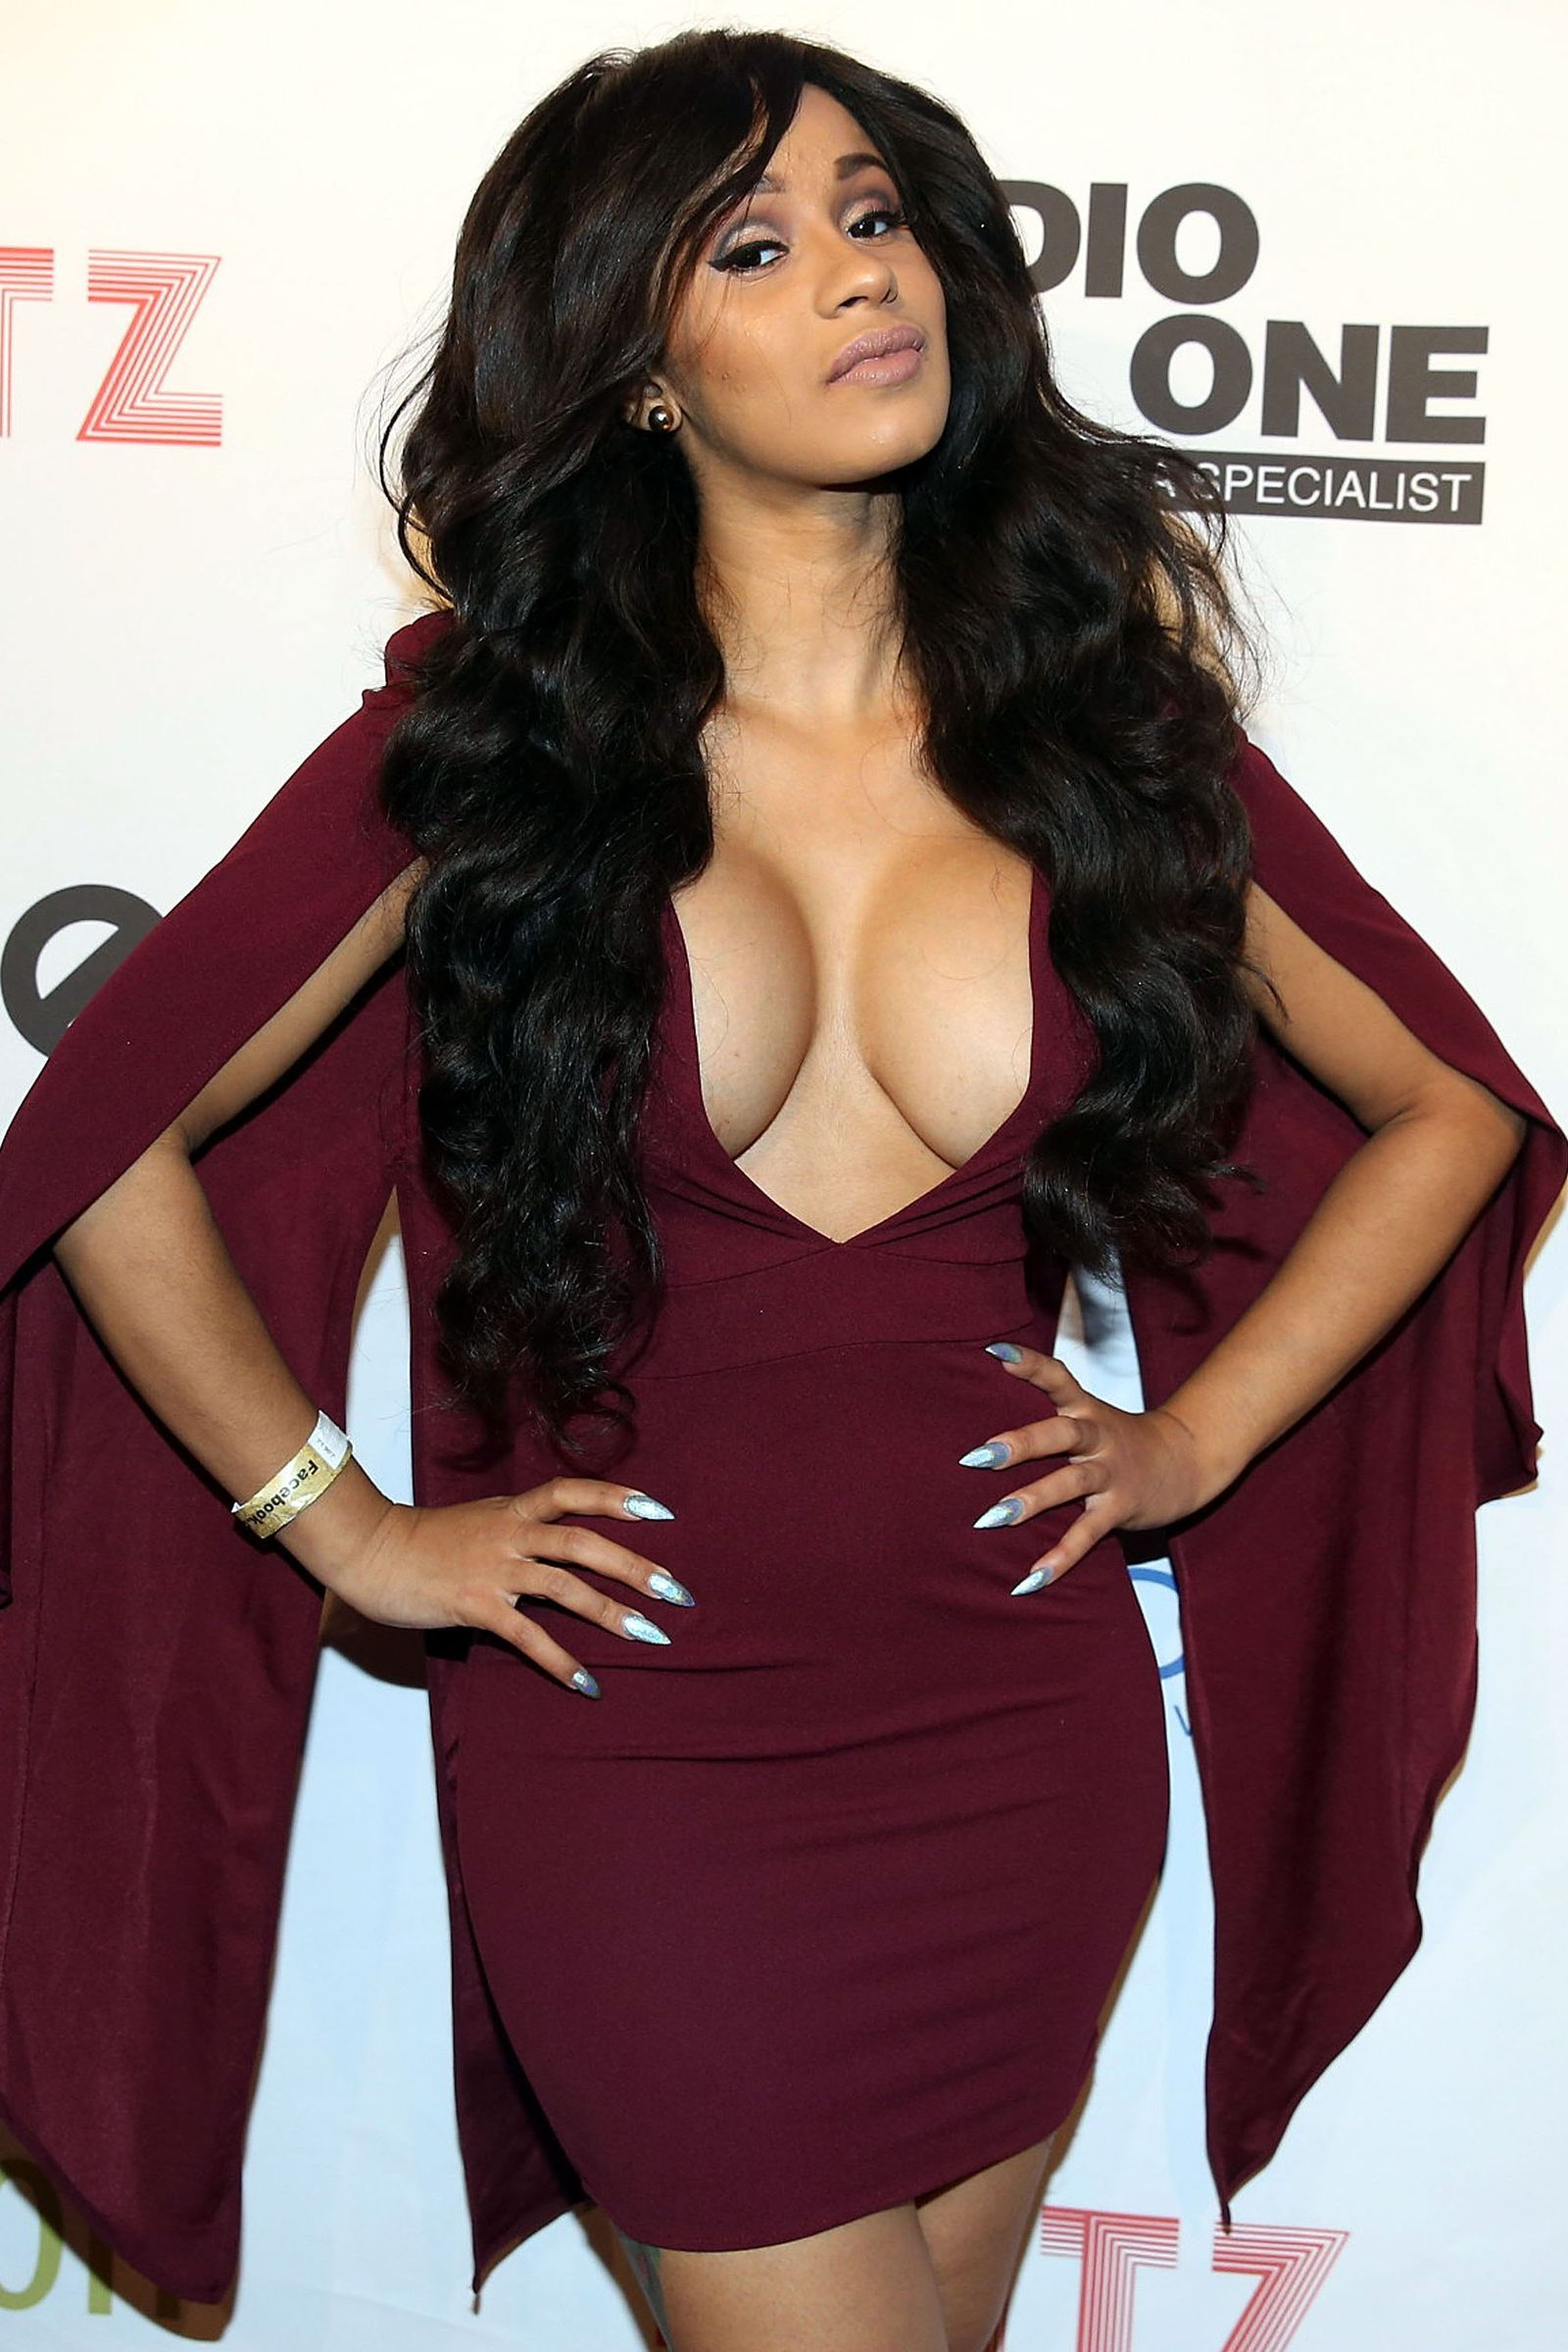 picture Cardi b deep cleavage public appearances